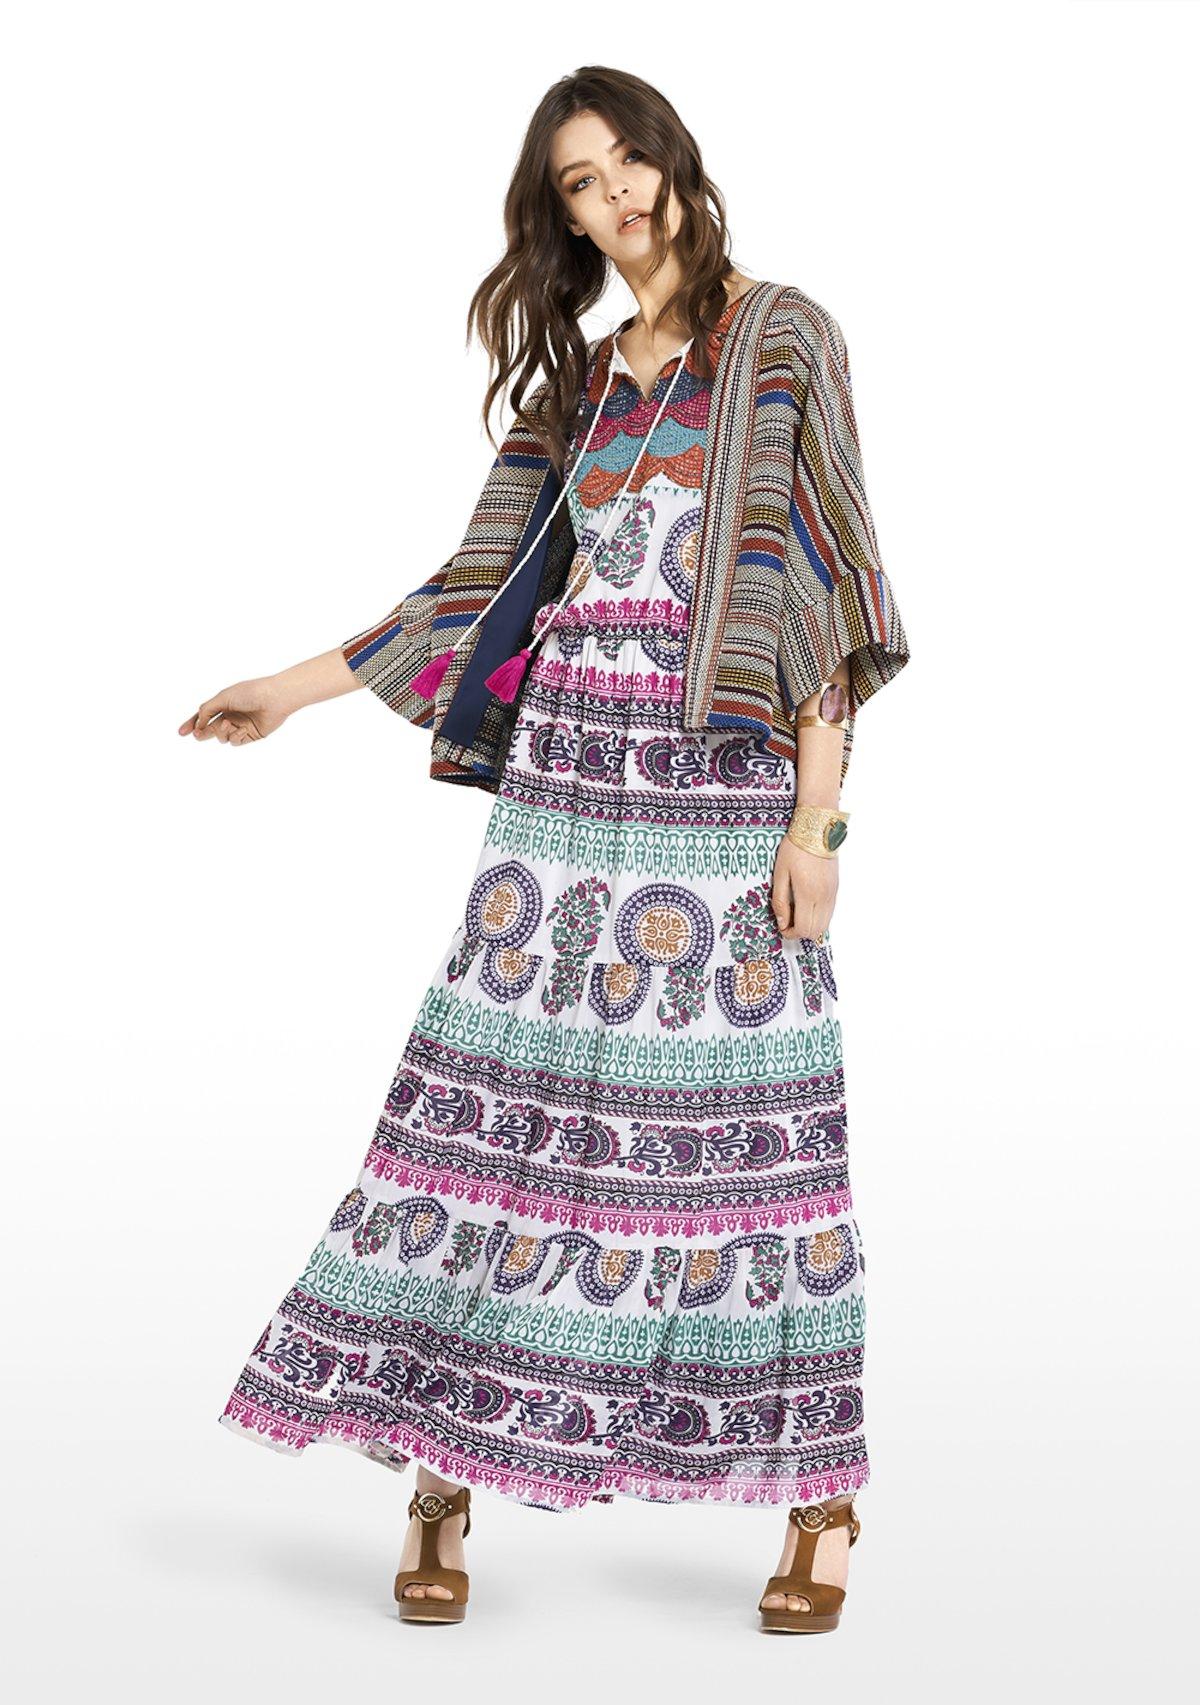 CRISTIAN - Beige / Rame Stripes - Woman - Category image